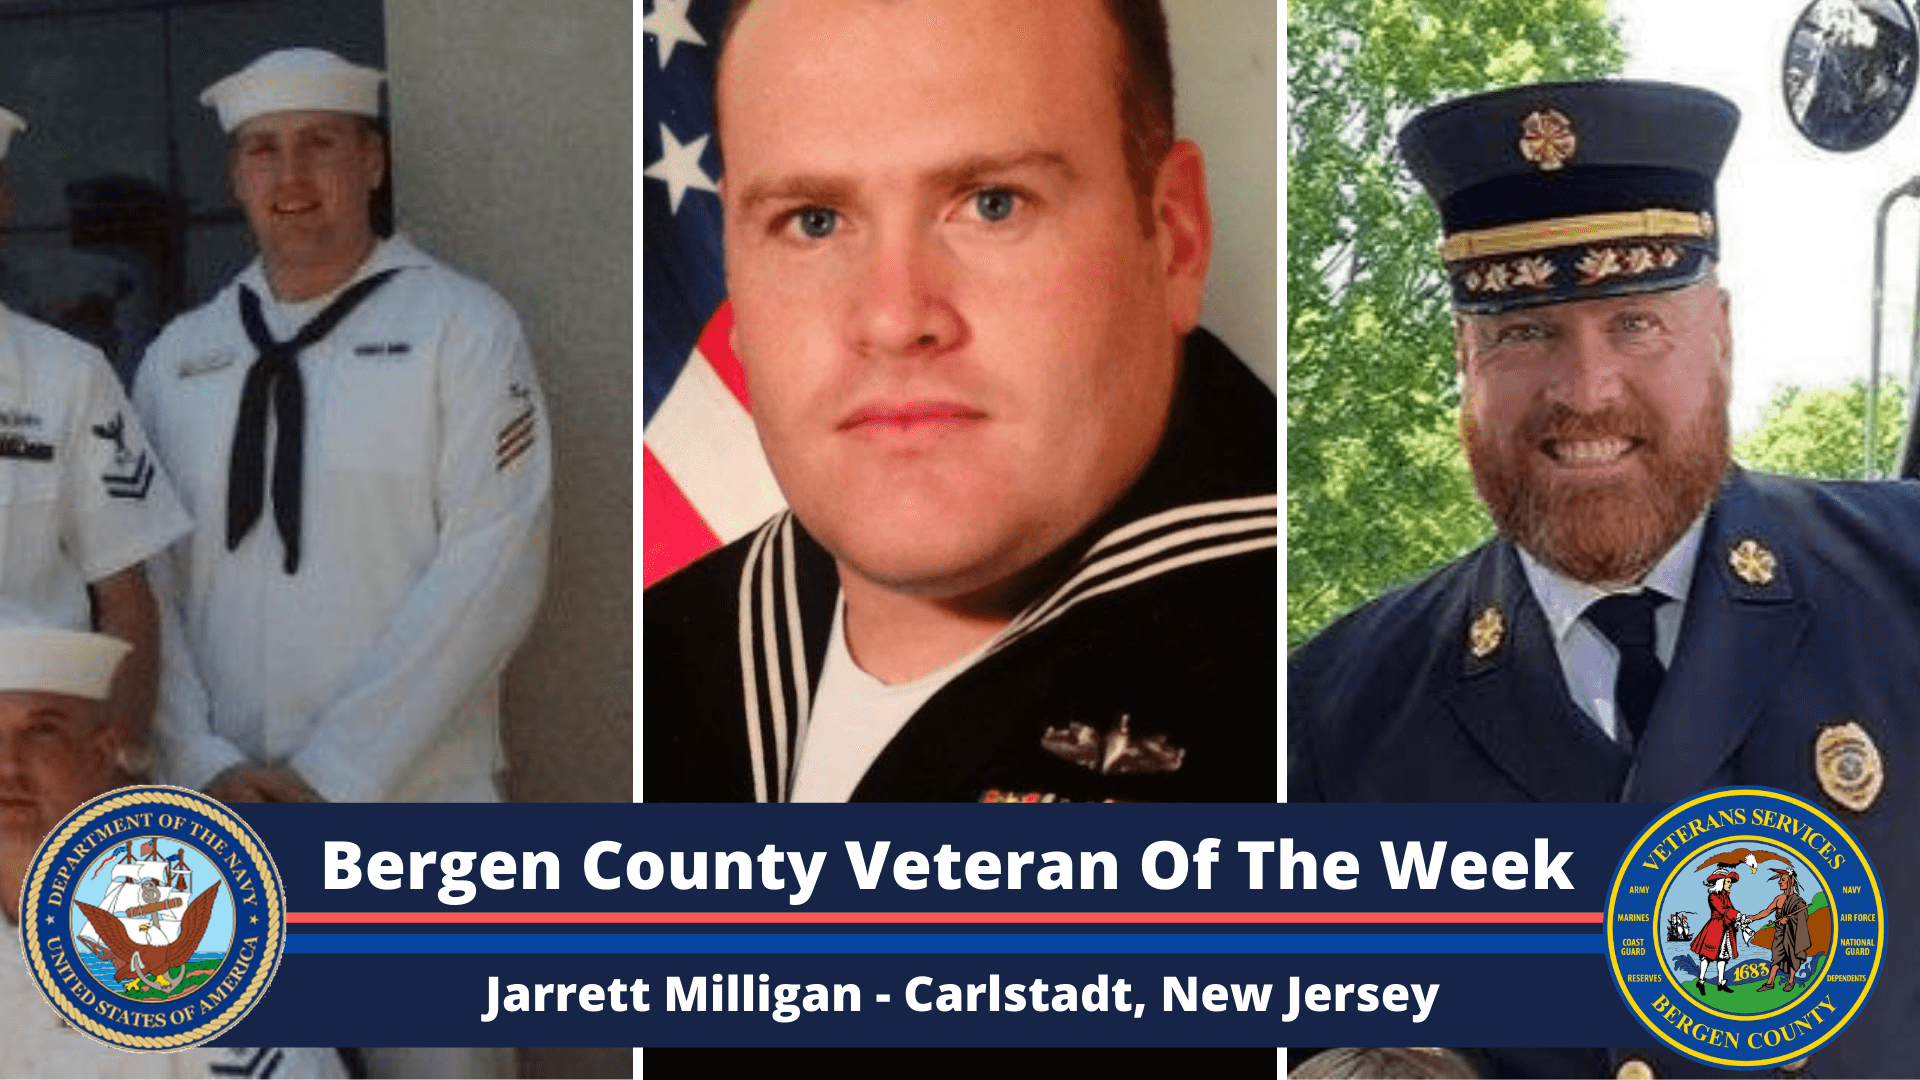 Bergen County Veteran of the Week: Jarrett Milligan